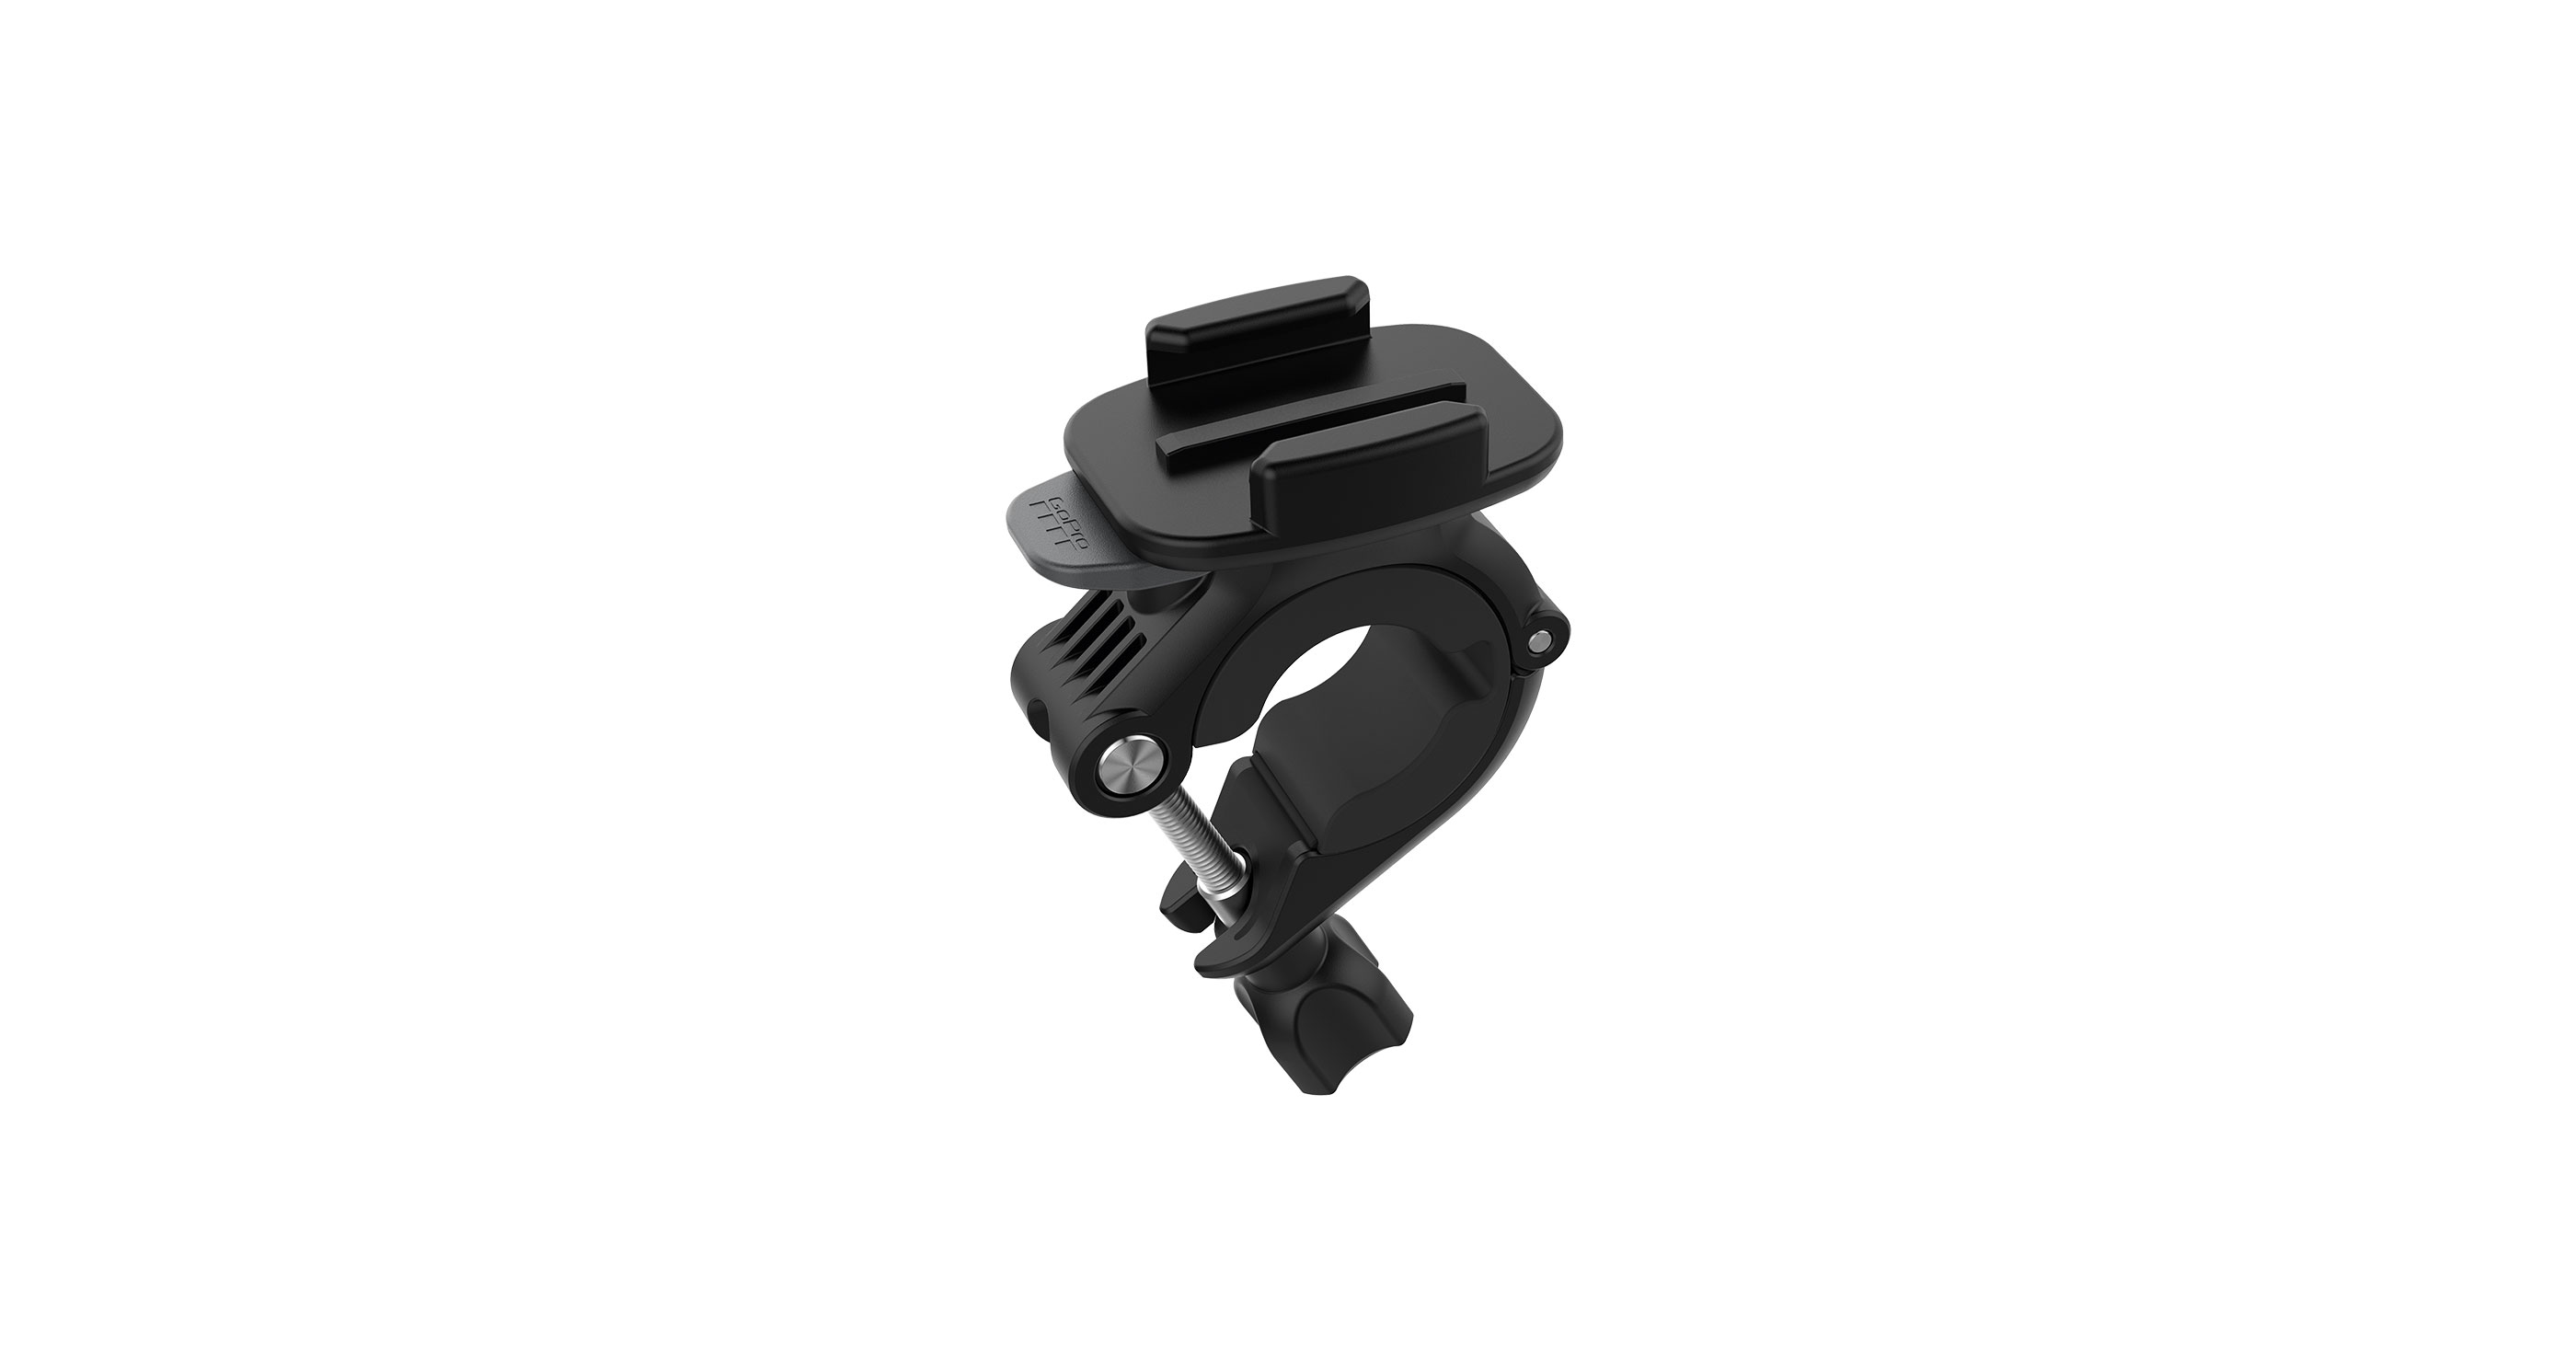 Sistem GoPro Handlebar/ Seatpost / Pole Mount AGTSM-001